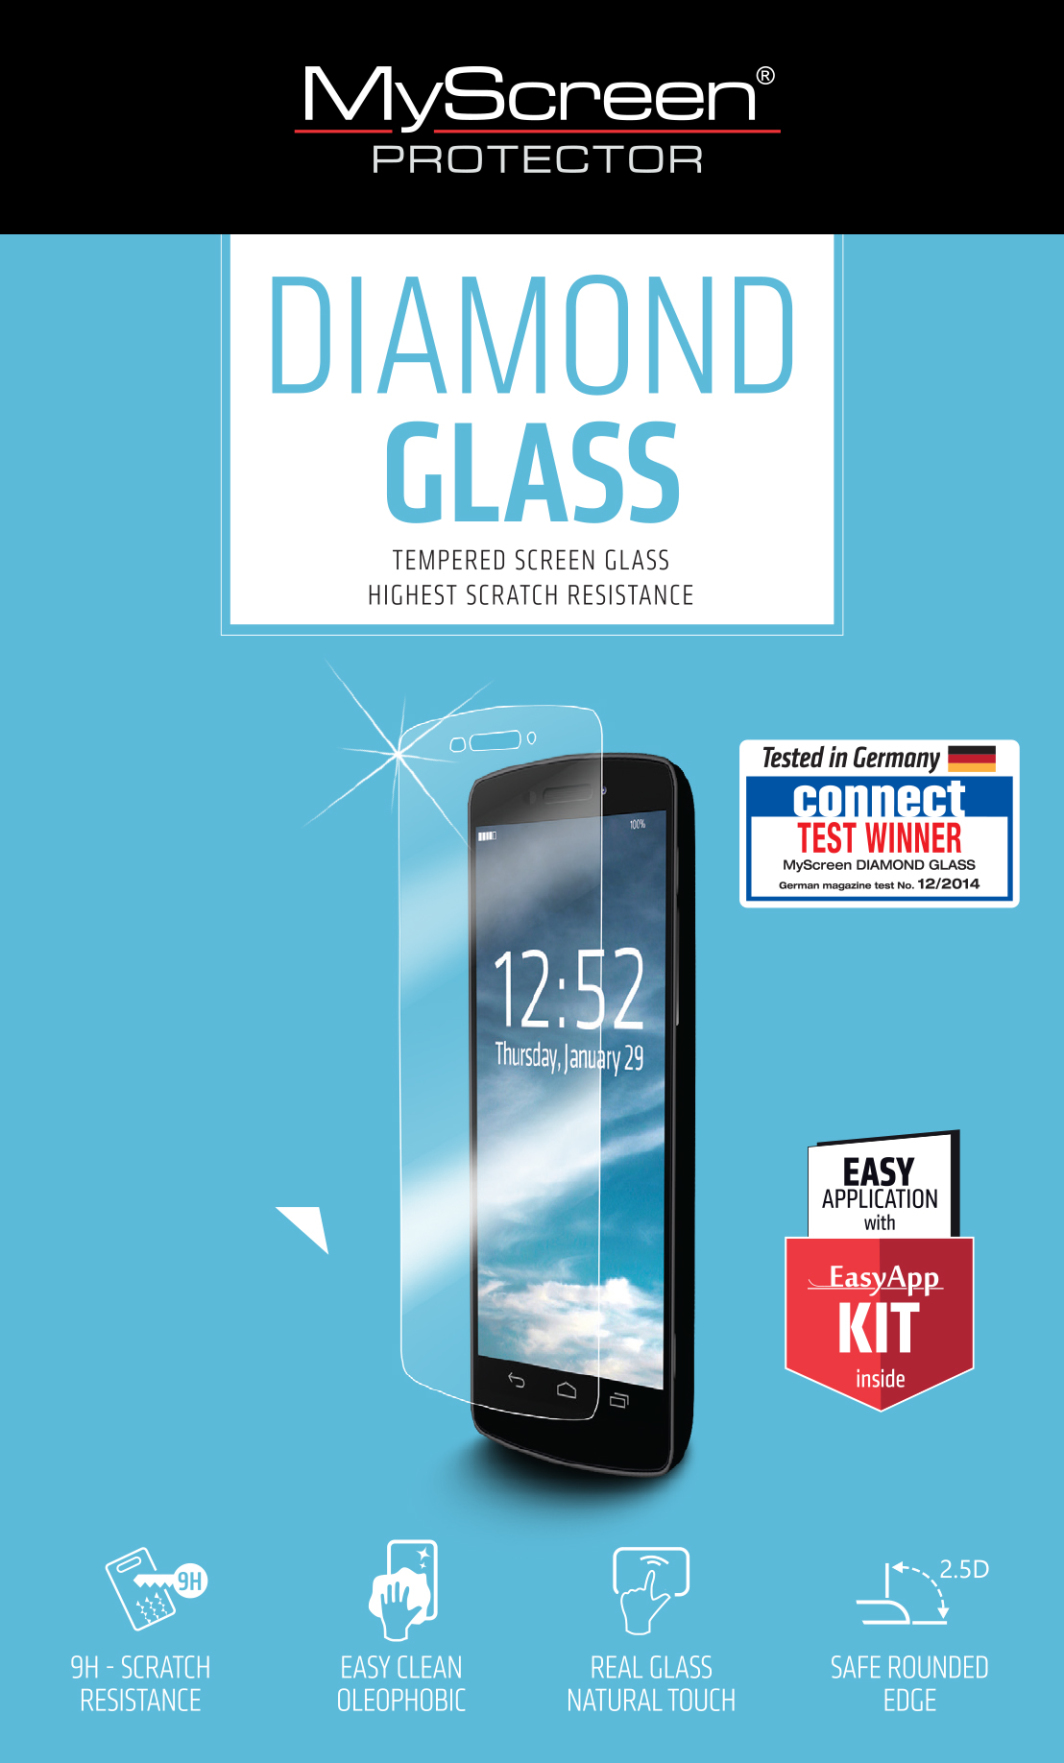 "MyScreen Protector DIAMOND HybridGLASS 5"" EA Kit Lenovo Moto Z (001585860000) 1"